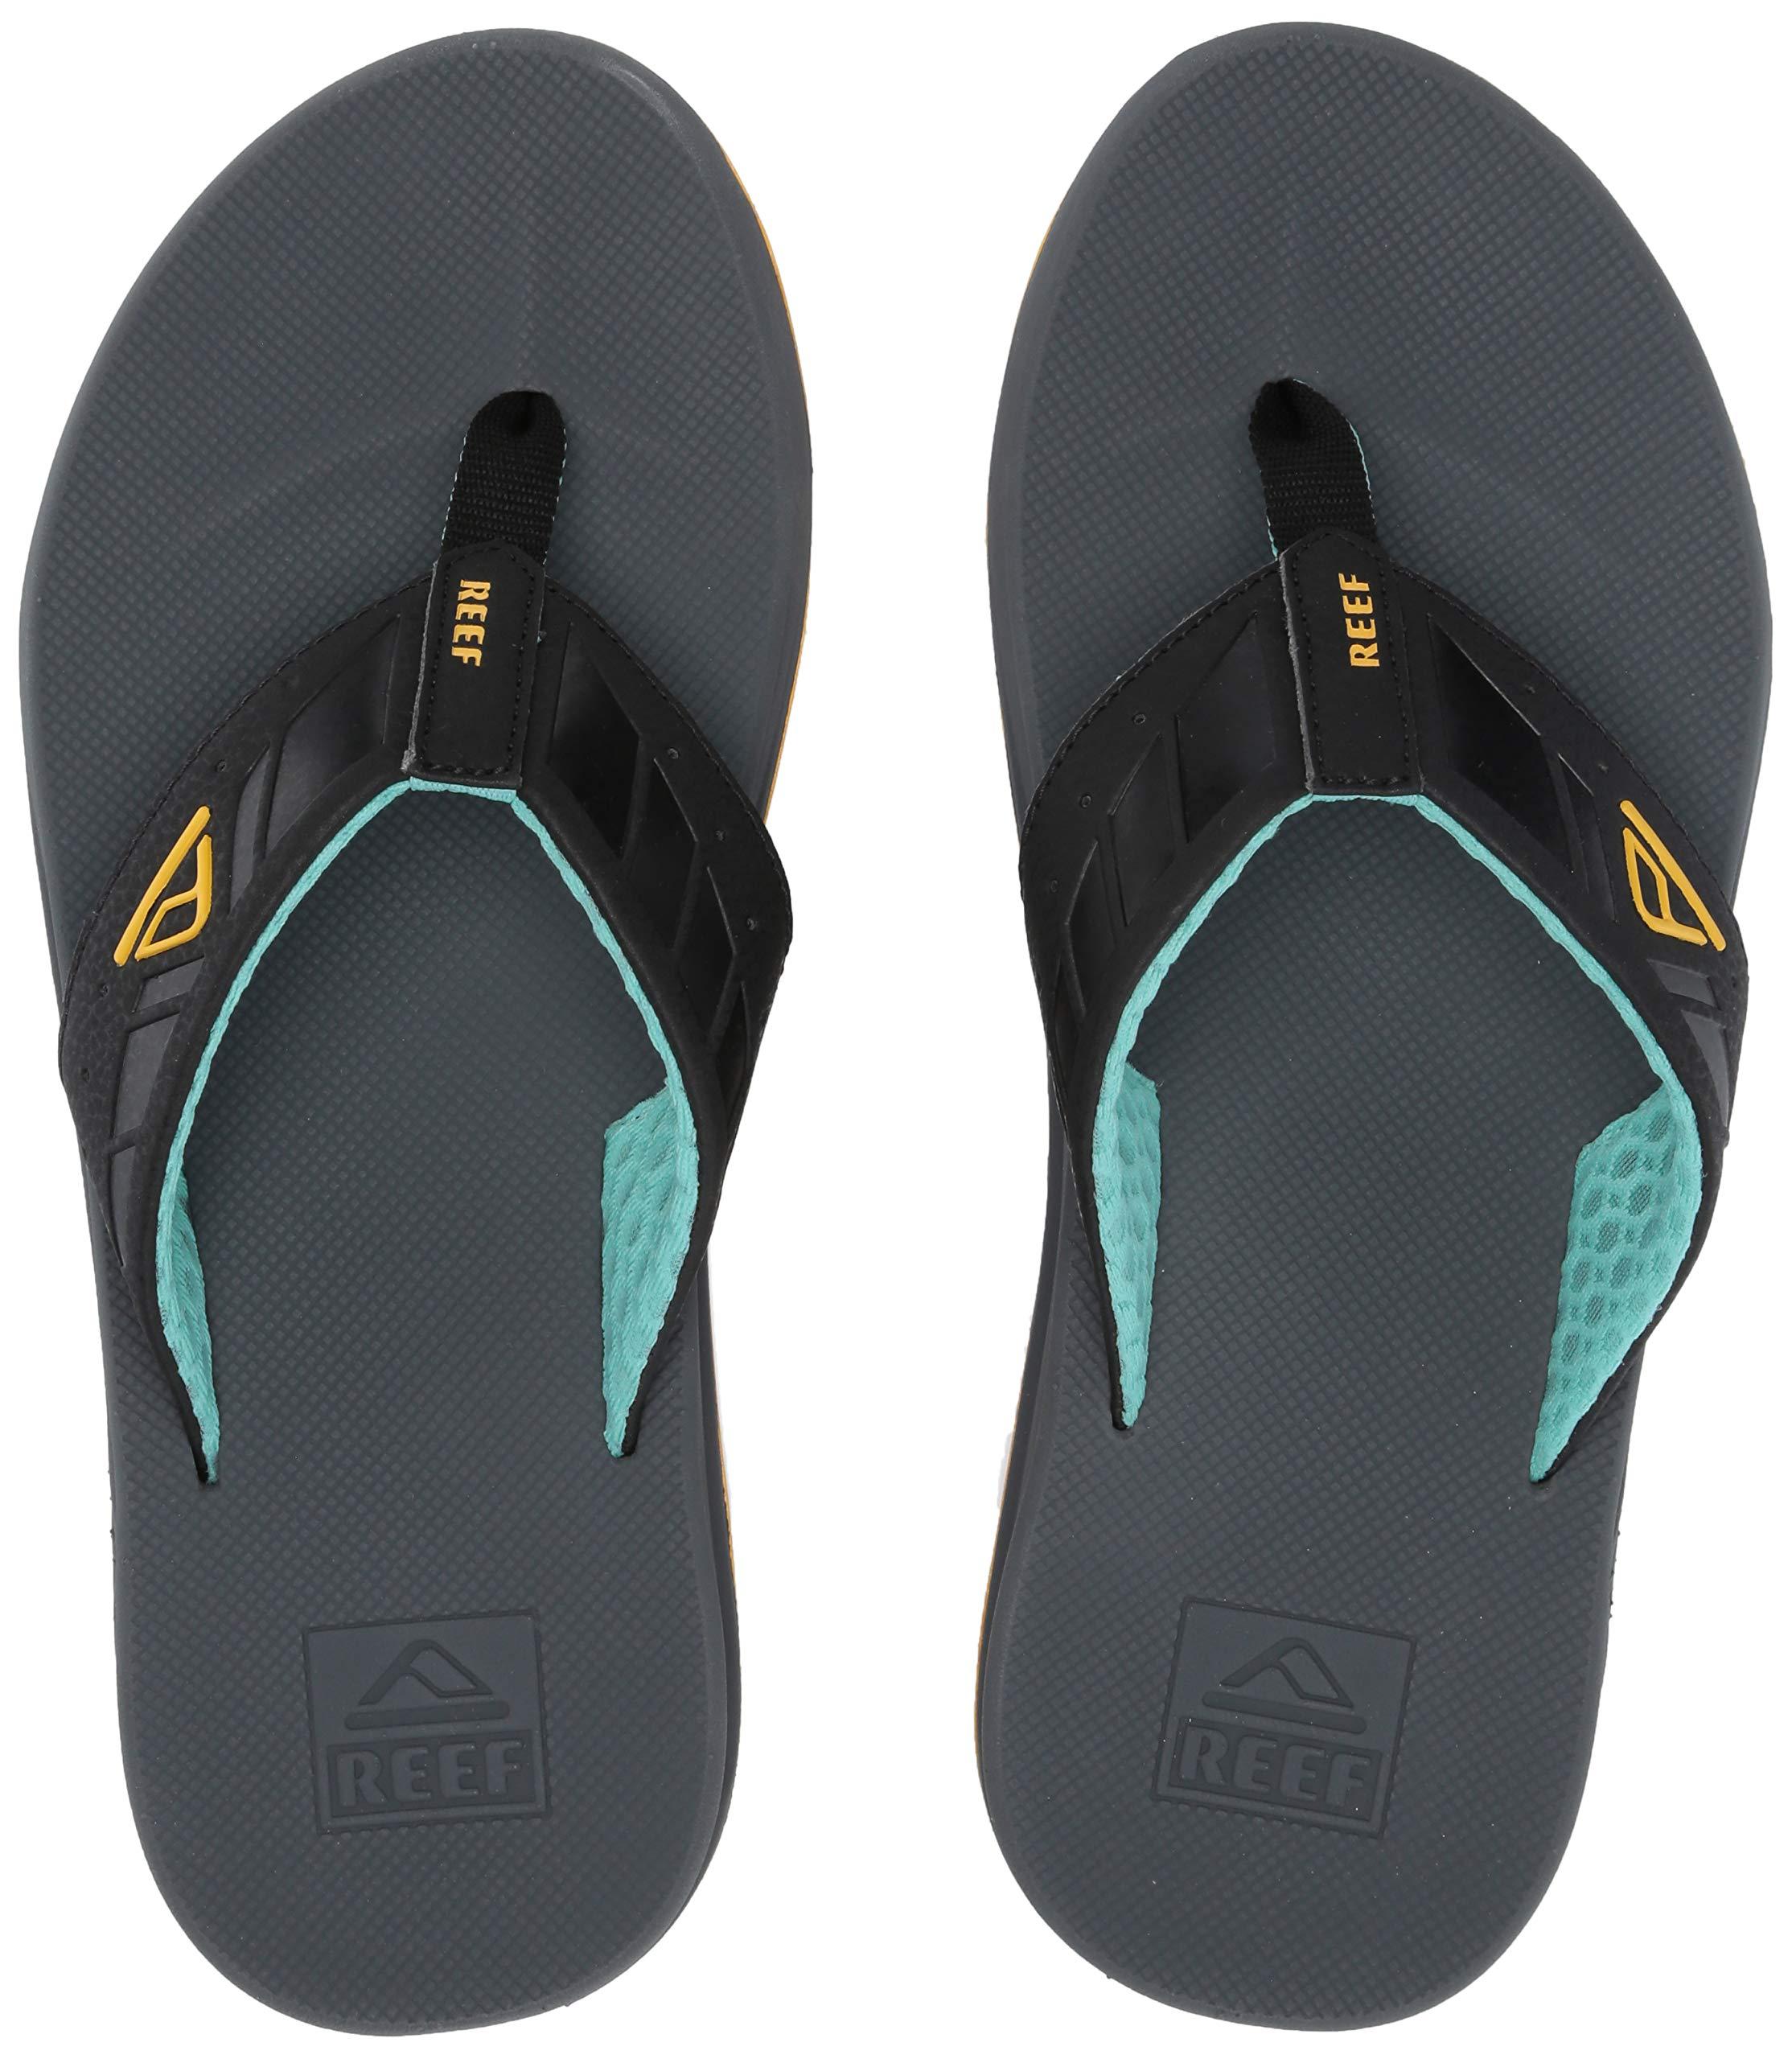 Reef Men's Phantoms Sandal, Aqua/Yellow, 130 M US